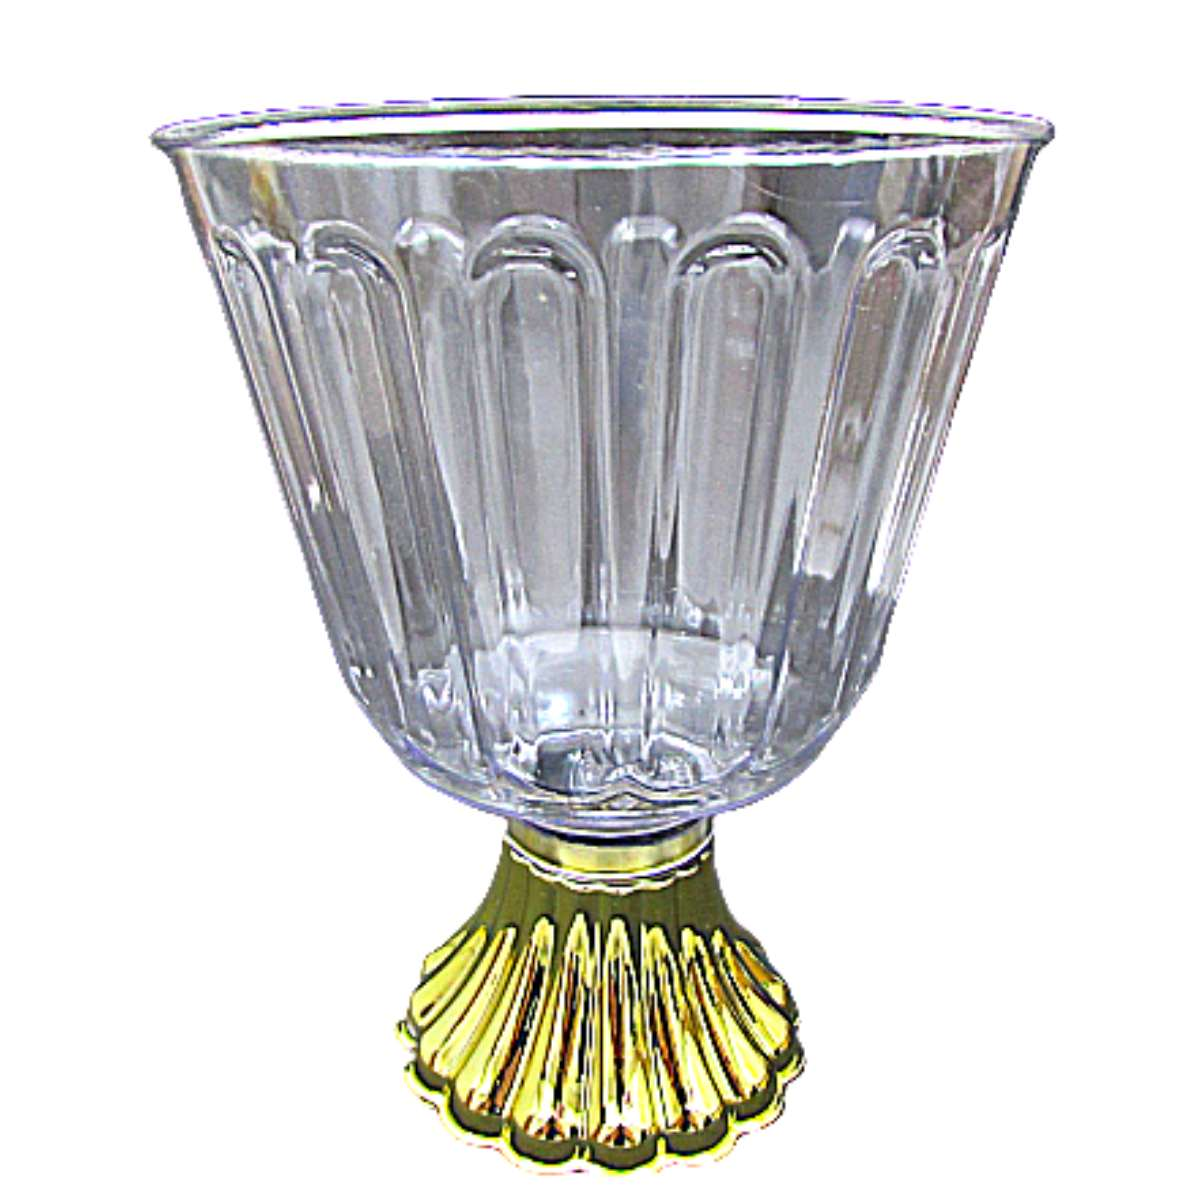 Taça de Acrílico Luxo Ouro Bolo na Taça Confeiteiro 1,250ml